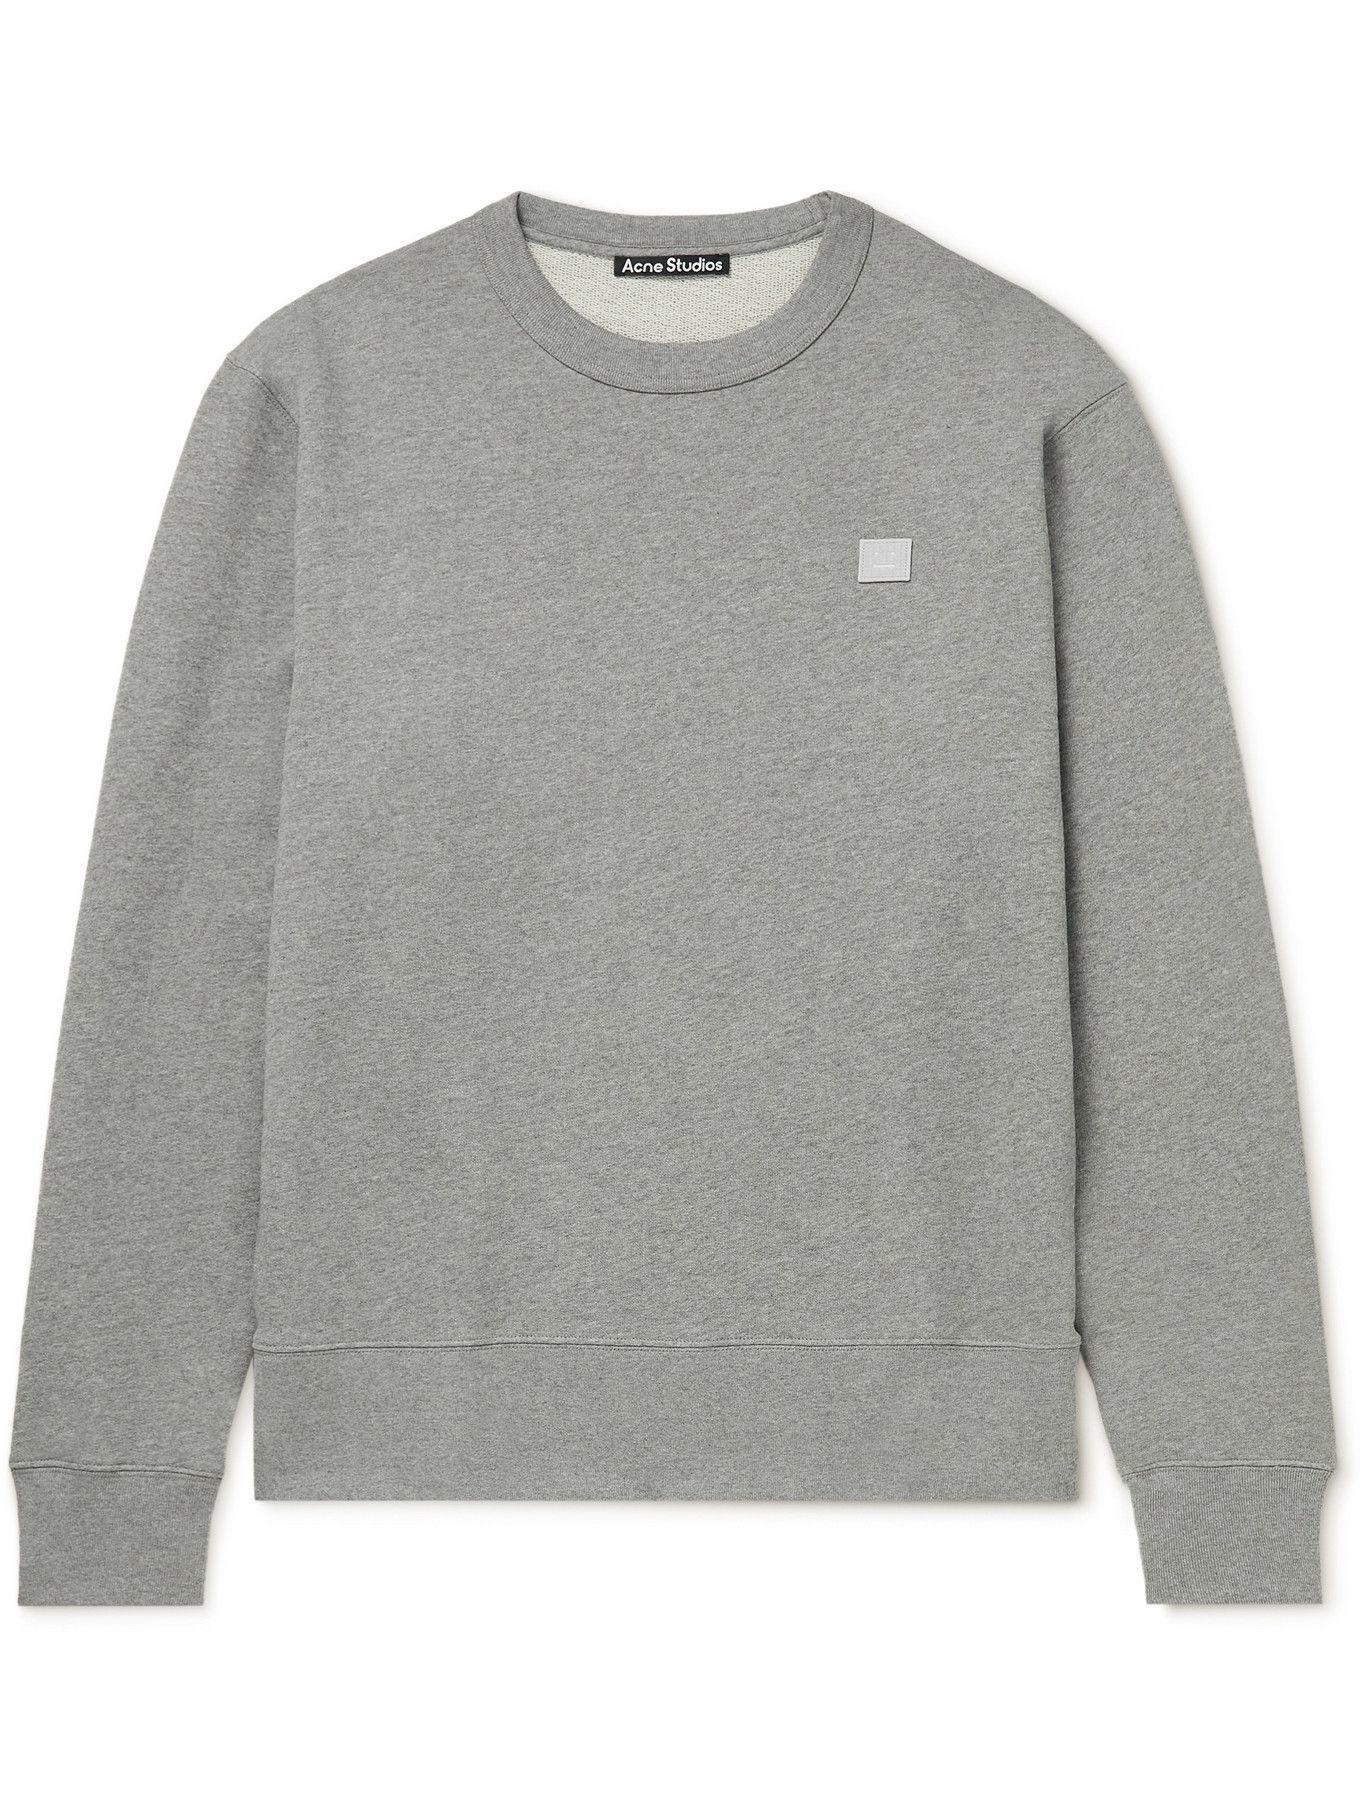 Photo: ACNE STUDIOS - Logo-Appliquéd Organic Cotton-Jersey Sweatshirt - Gray